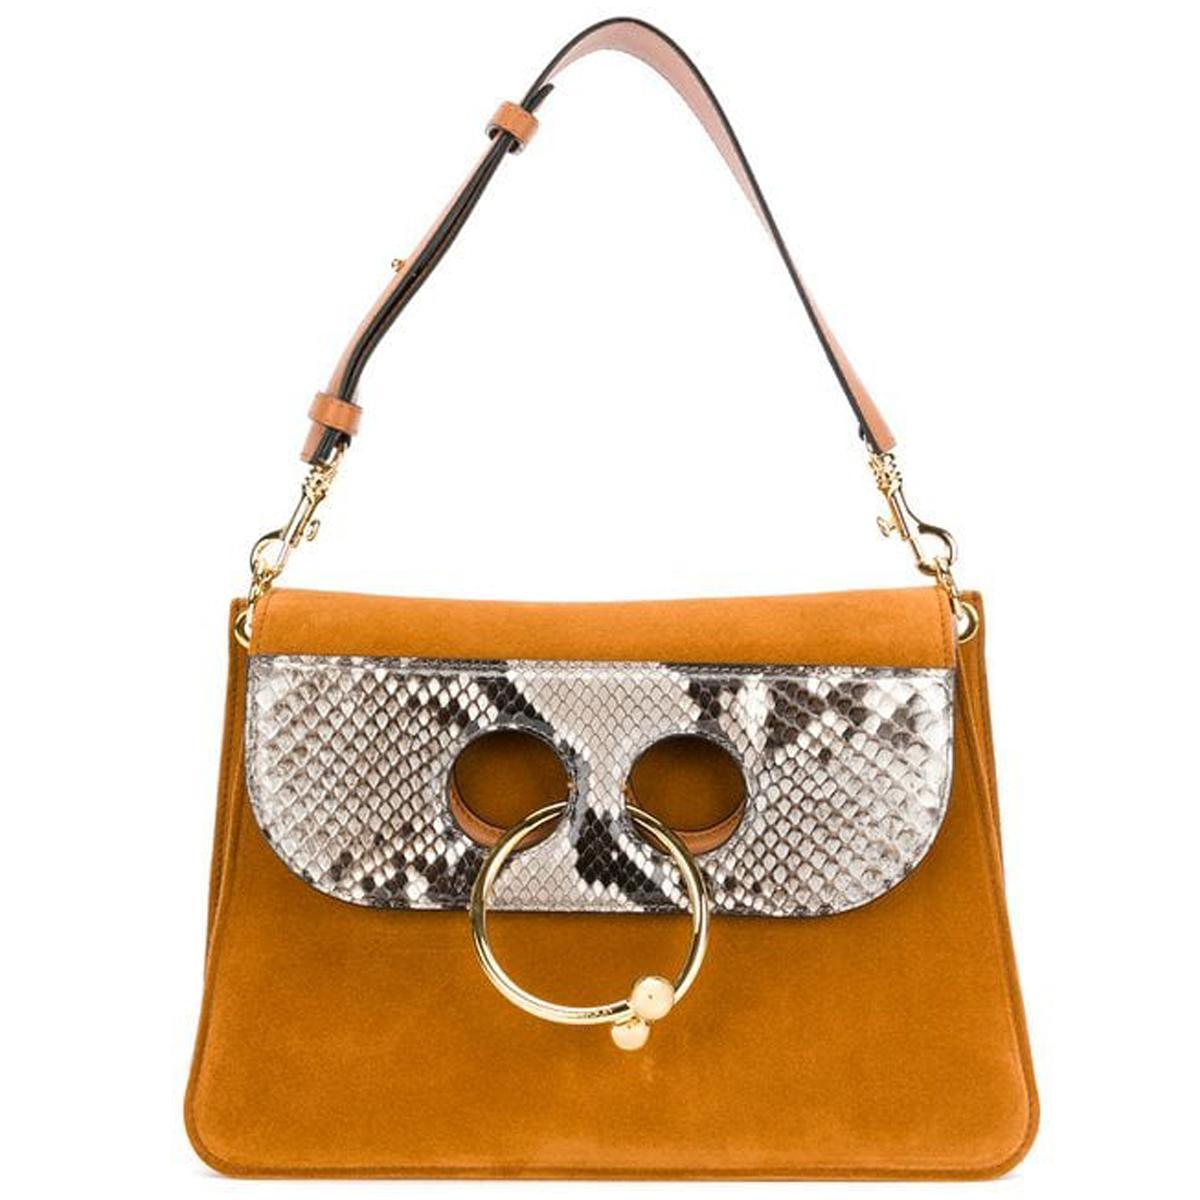 classic-designer-handbag-brands-271996-1541601312251-product.1200x0c.jpg (1200×1200)